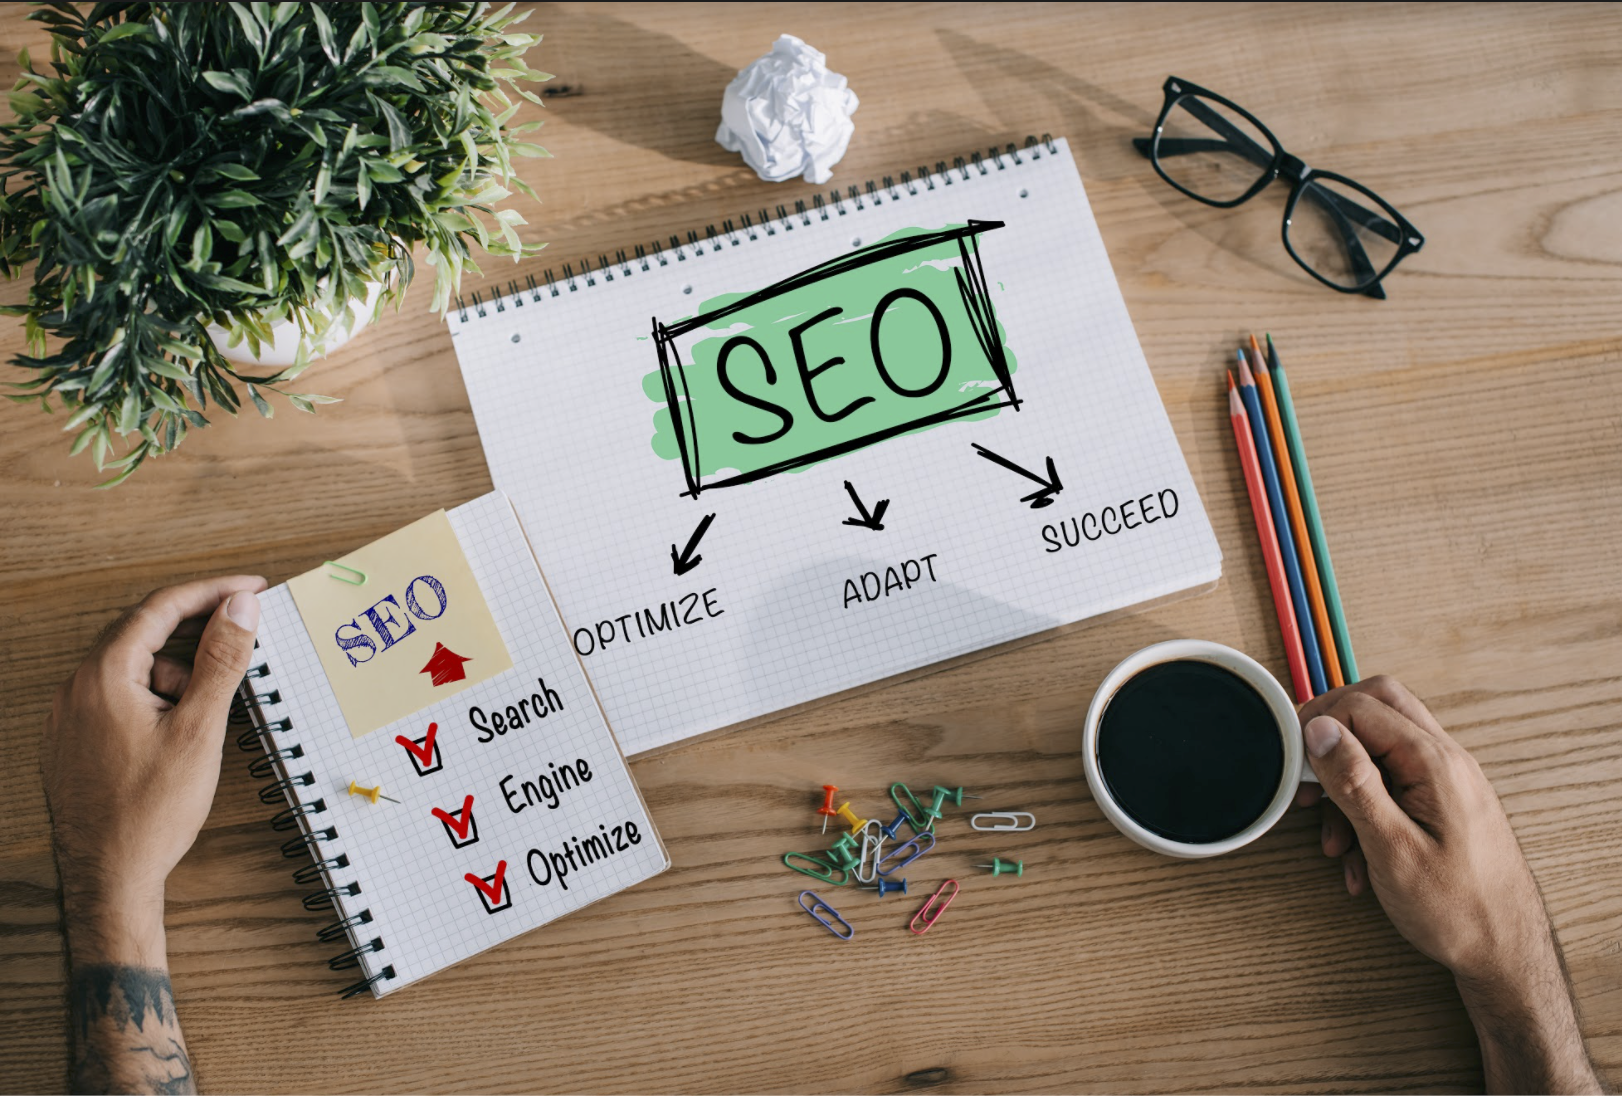 e-Commerce digital marketing agency ROI focused SEO marketing